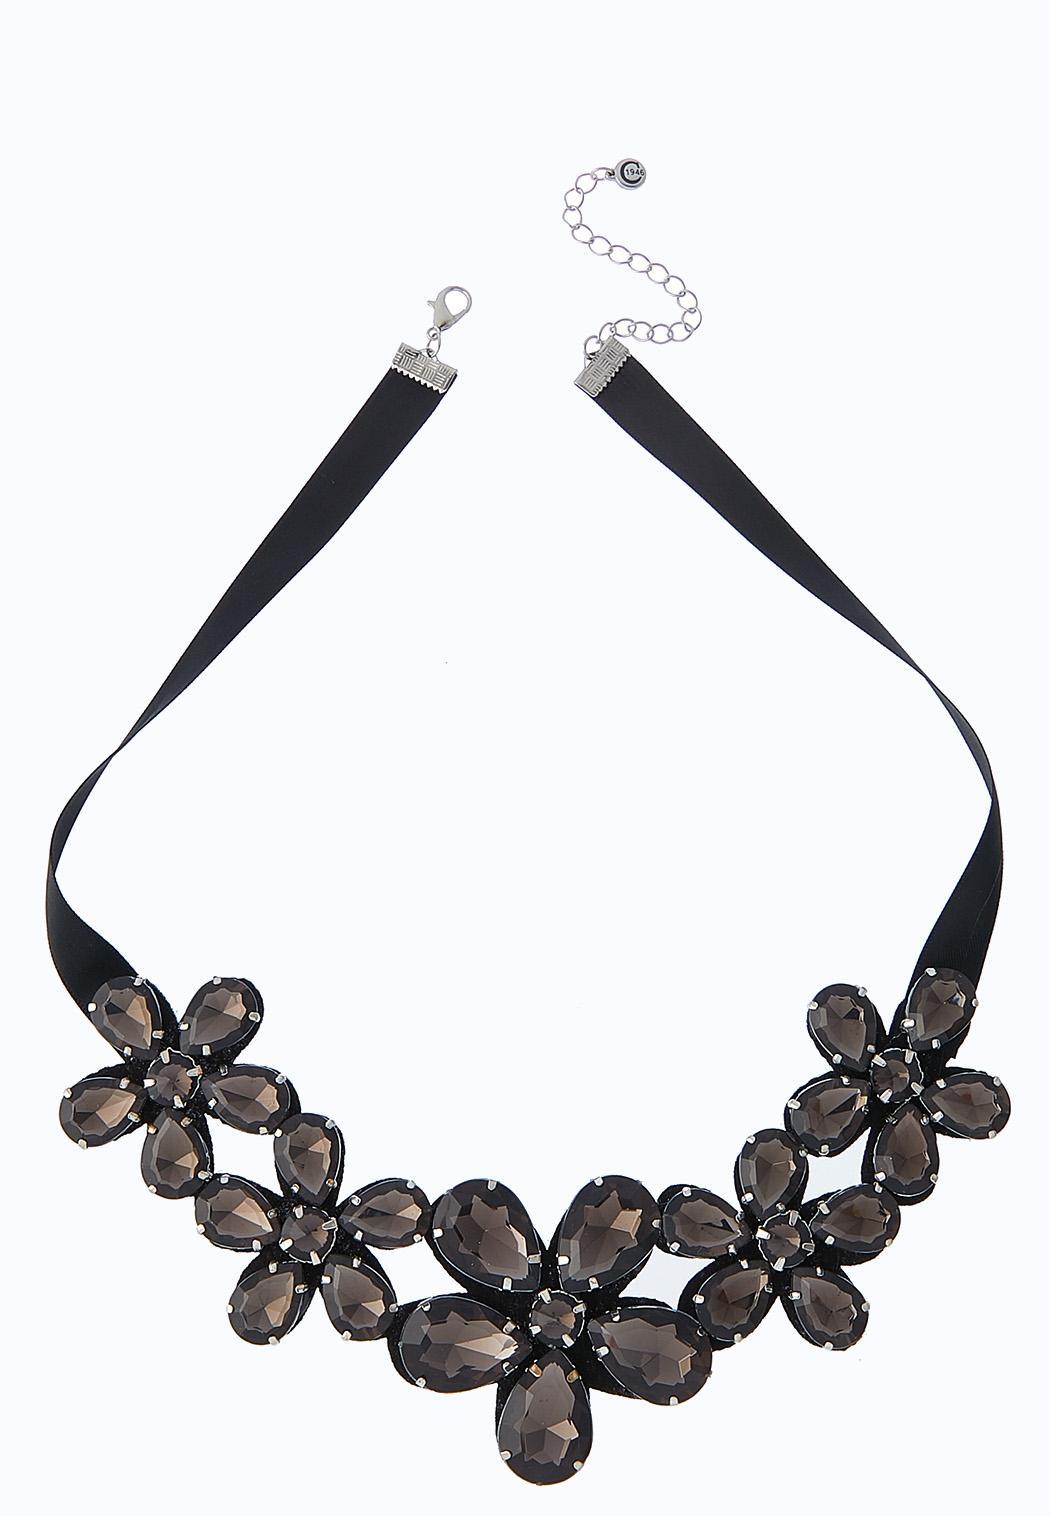 Acrylic Flower Statement Necklace